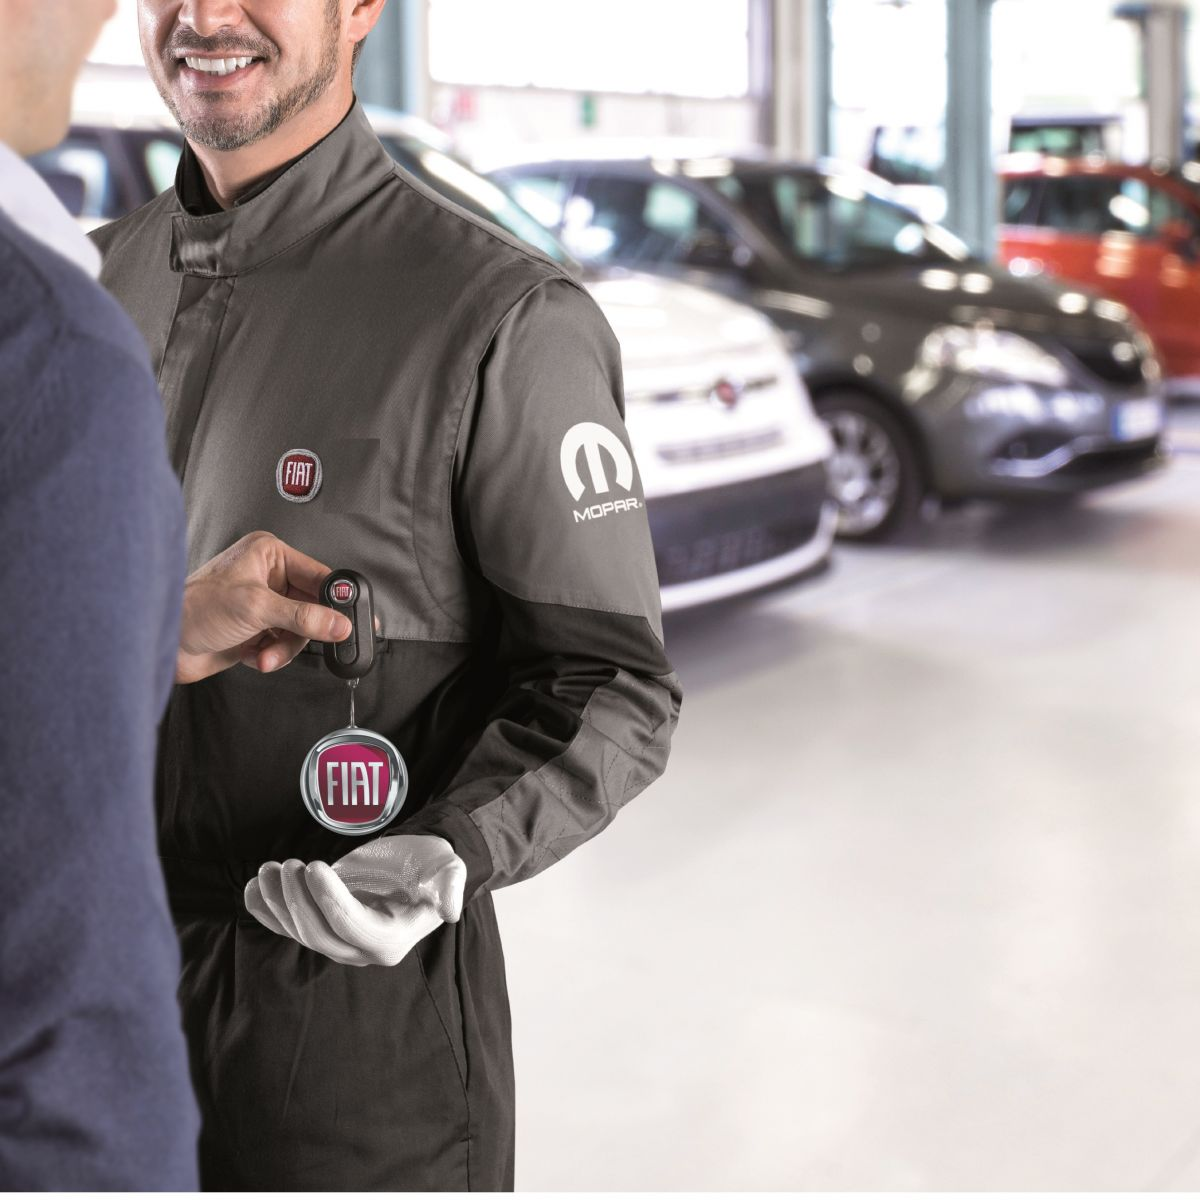 FCA2Bwinter2Bcheck2B2018 Δωρεάν χειμερινός έλεγχος για Fiat, Alfa Romeo, Abarth